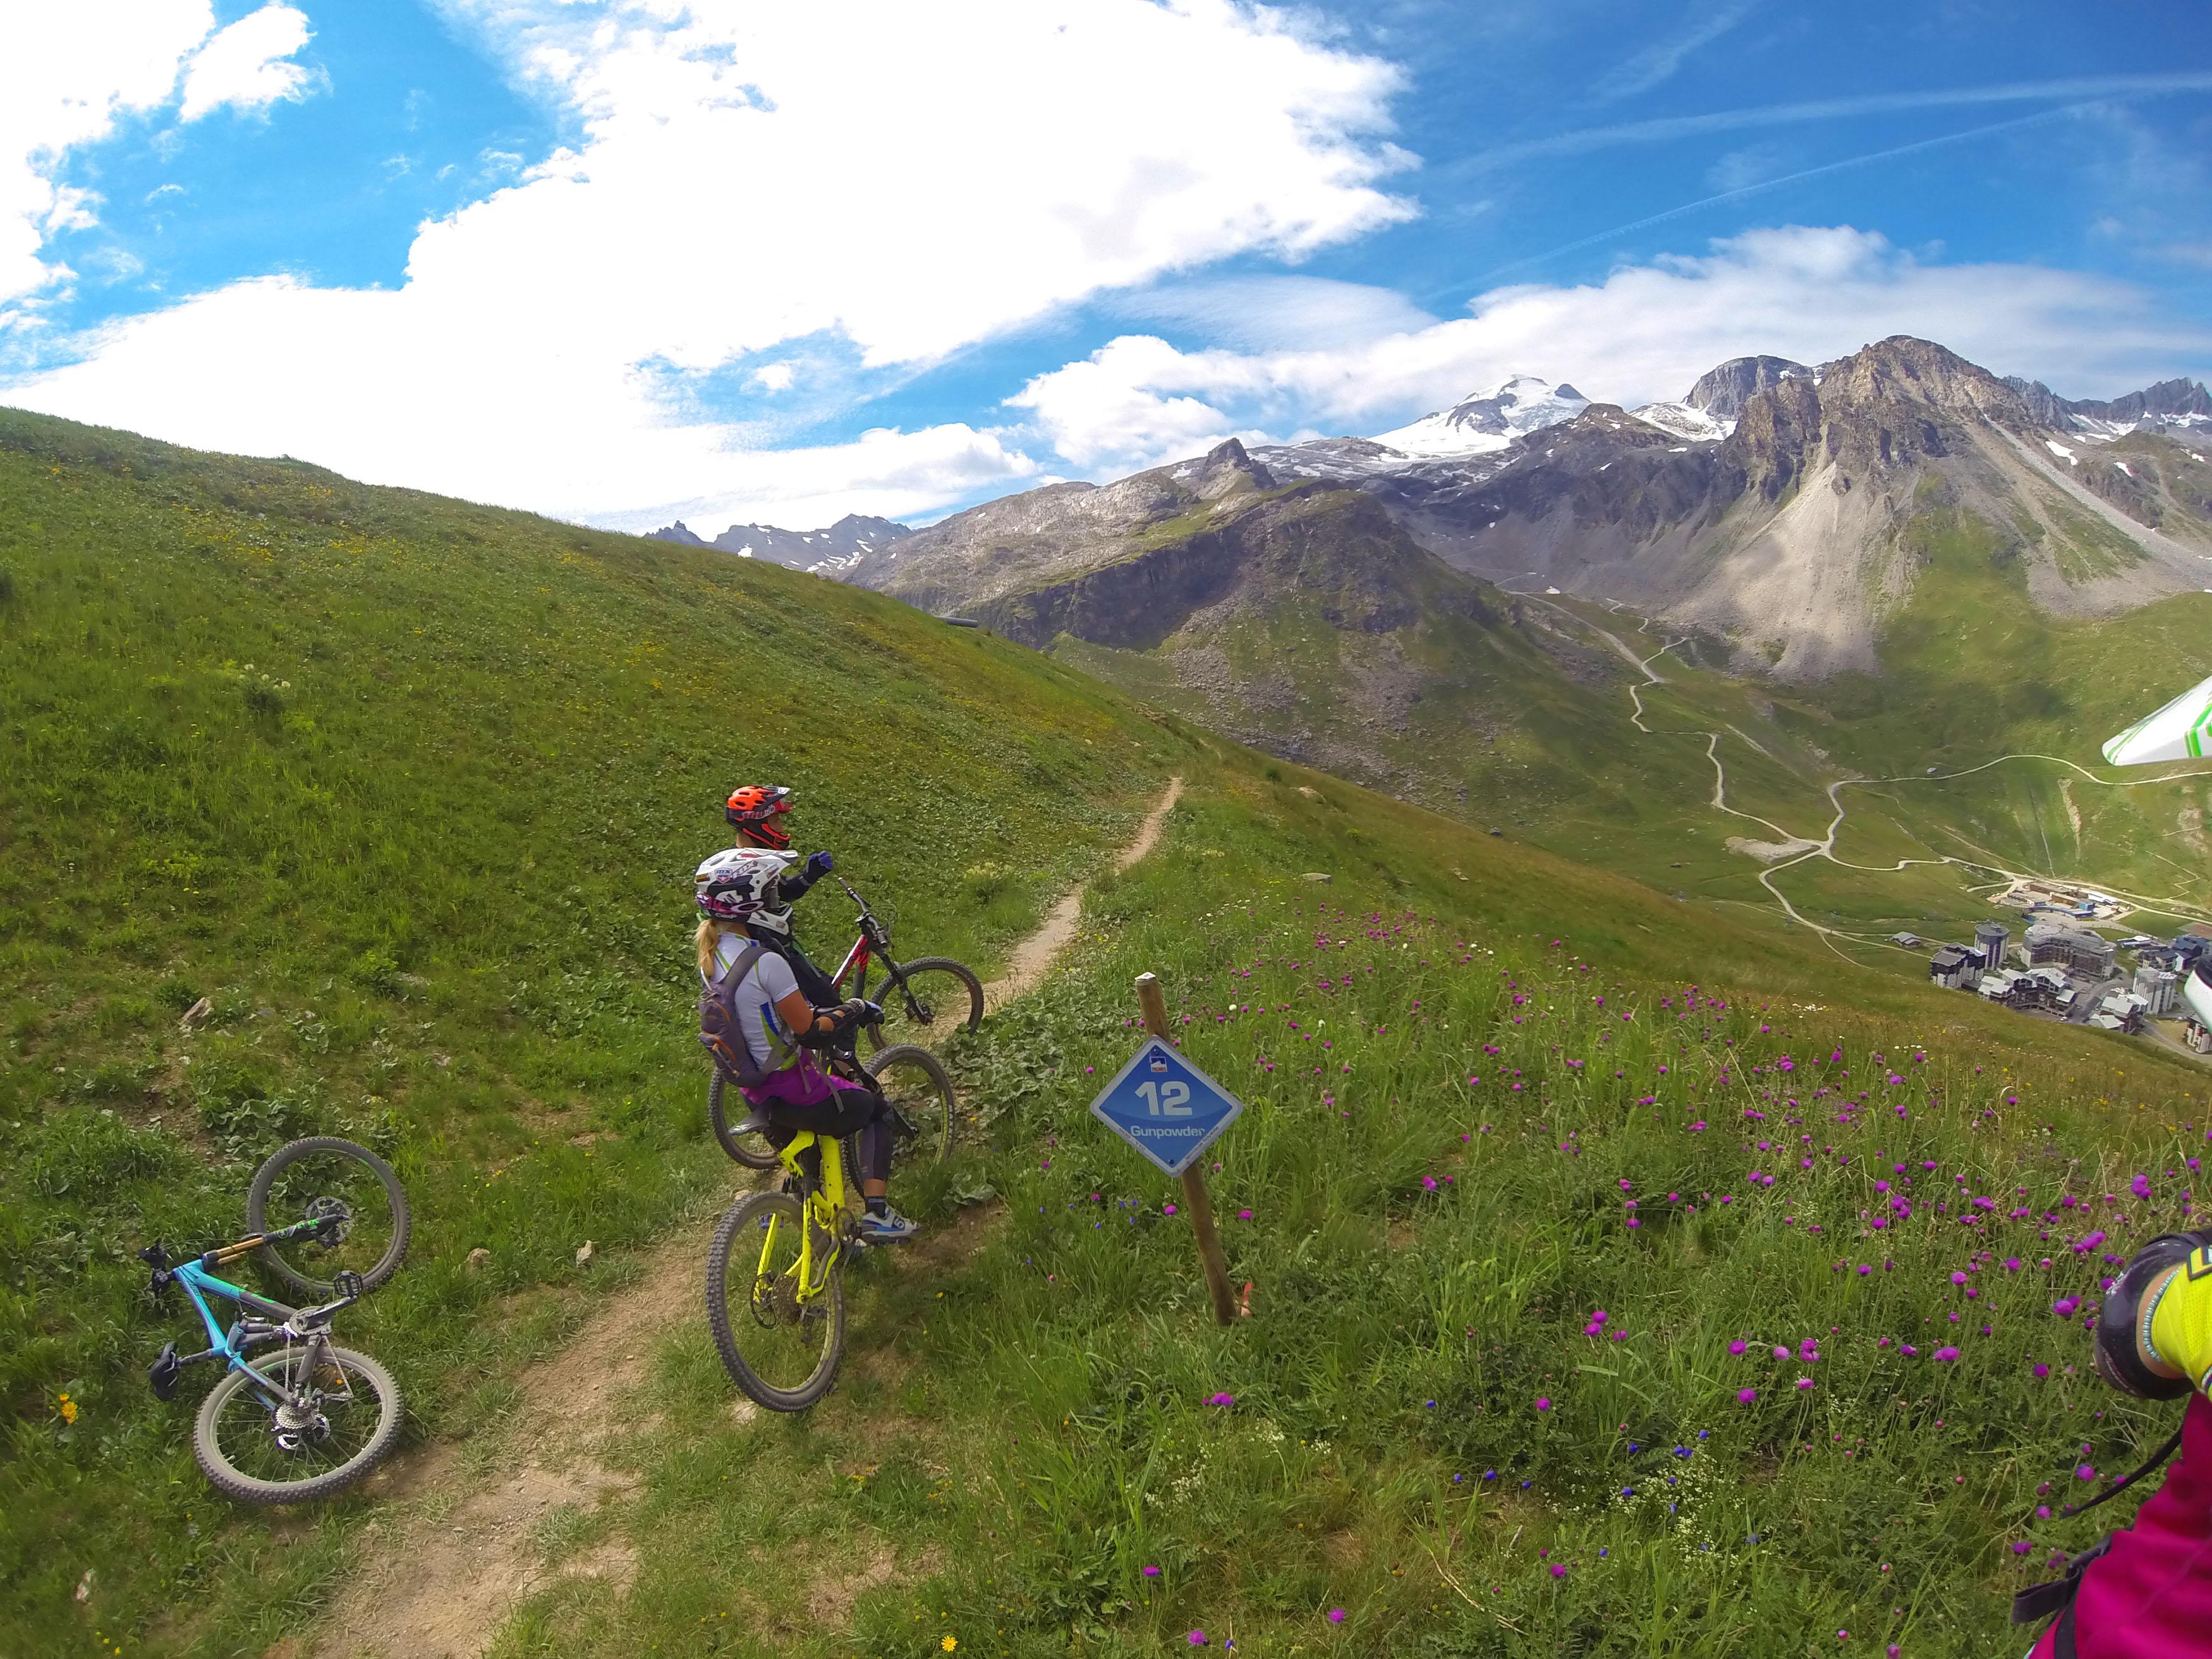 Biking In Tignes Alps Mountain